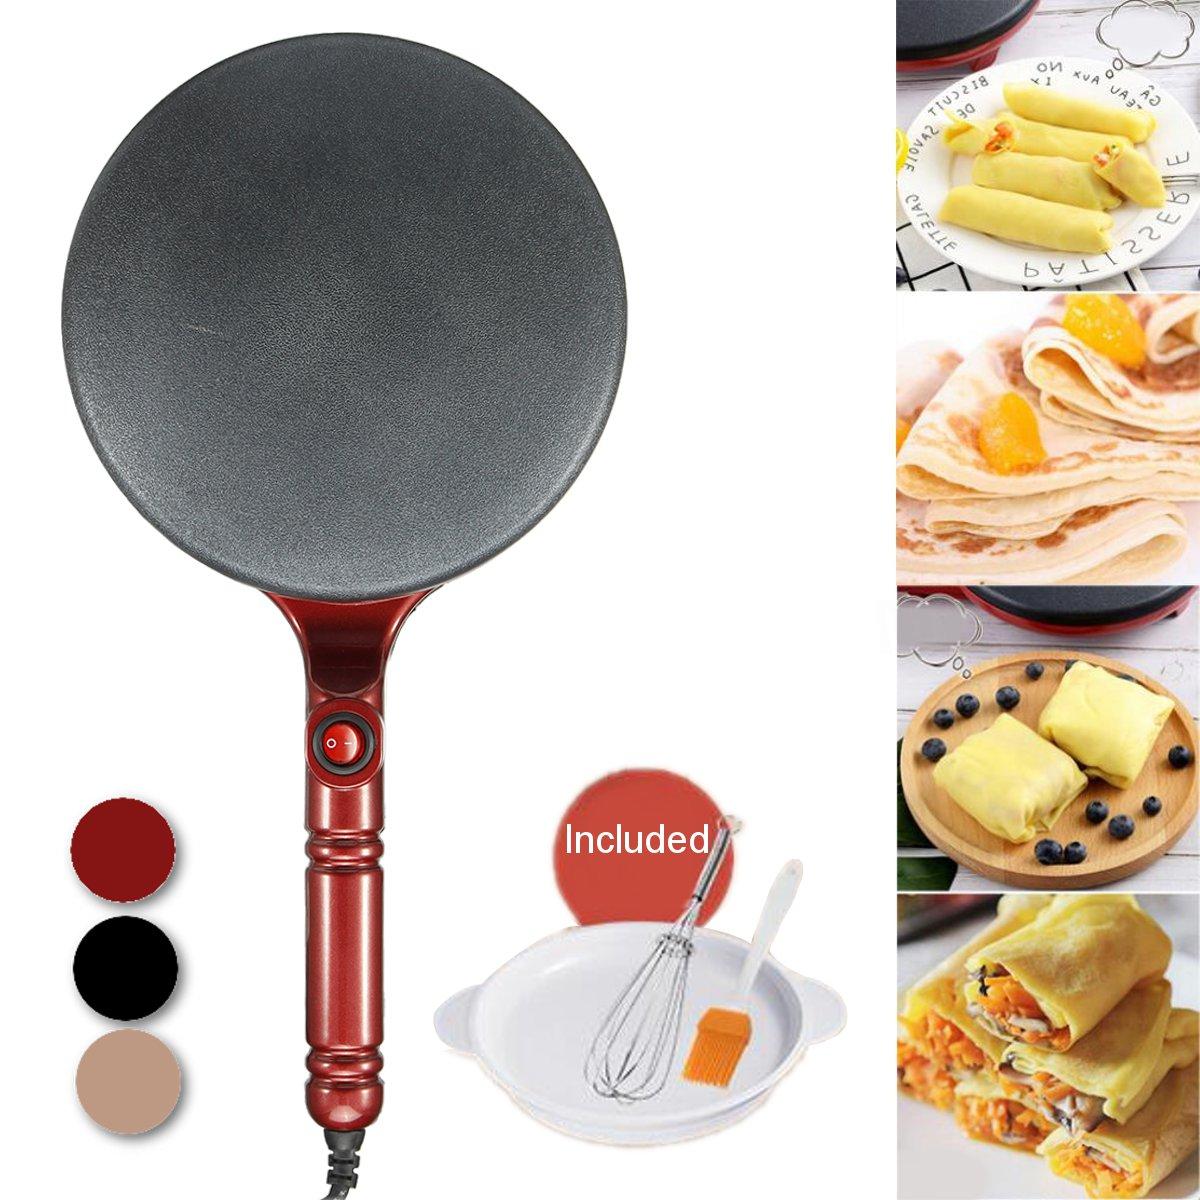 "7/"" Electric Crepe Maker Non Stick Baking Pancake Pan Frying Griddle Machine 220V"